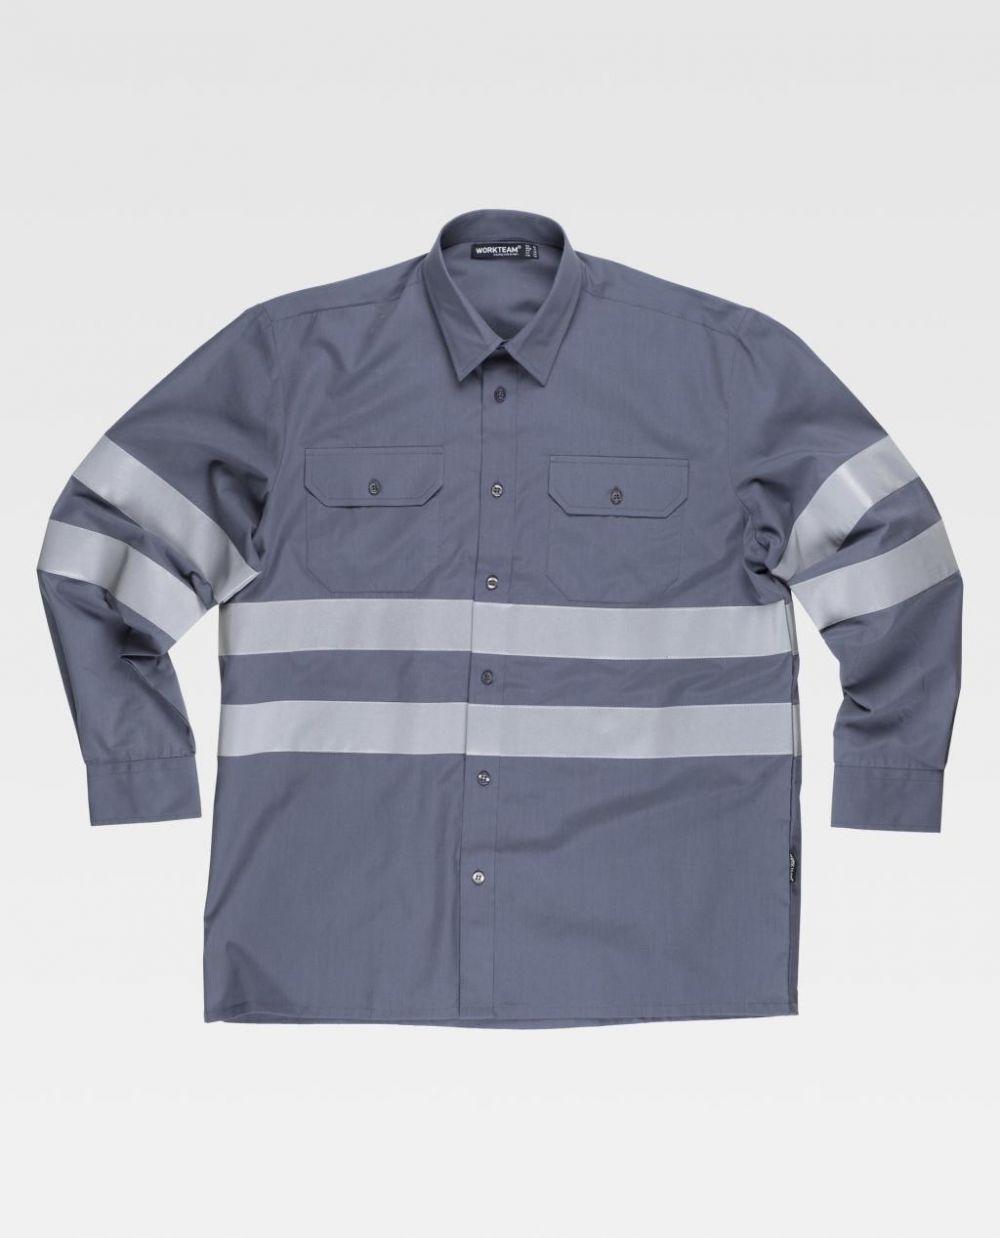 Camisas reflectante workteam ml cintas reflectantes de poliéster para personalizar vista 1